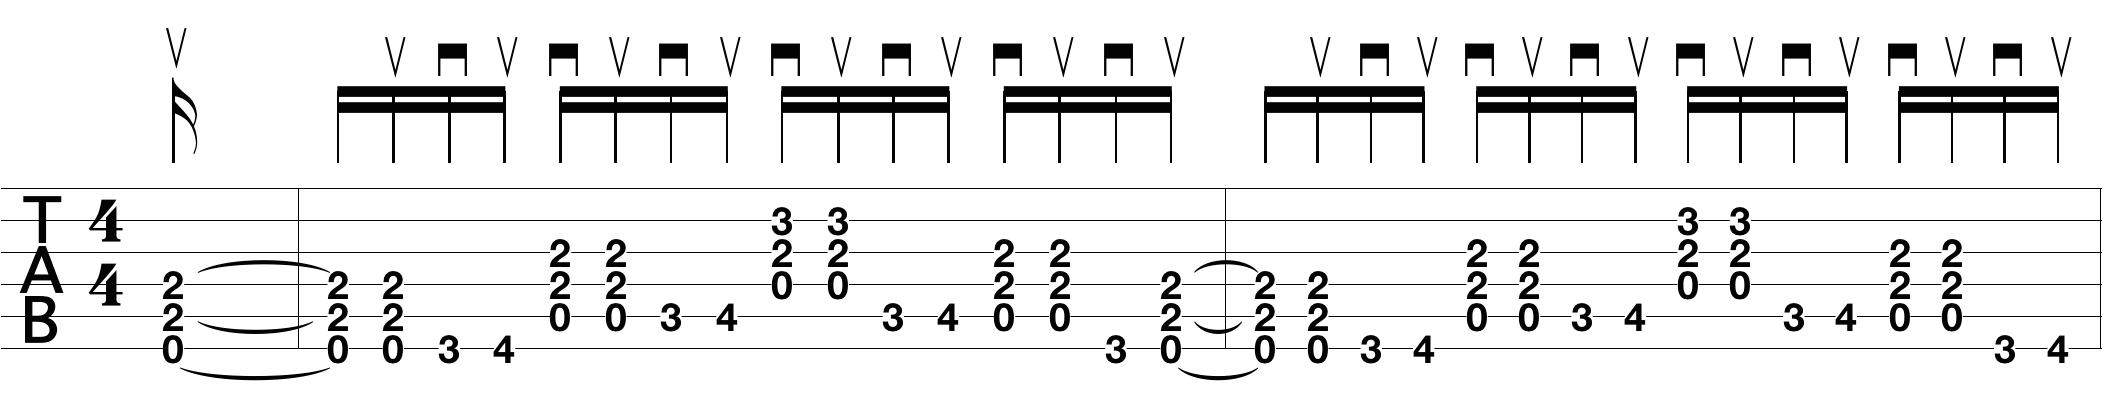 top-20-guitar-riffs_2.png